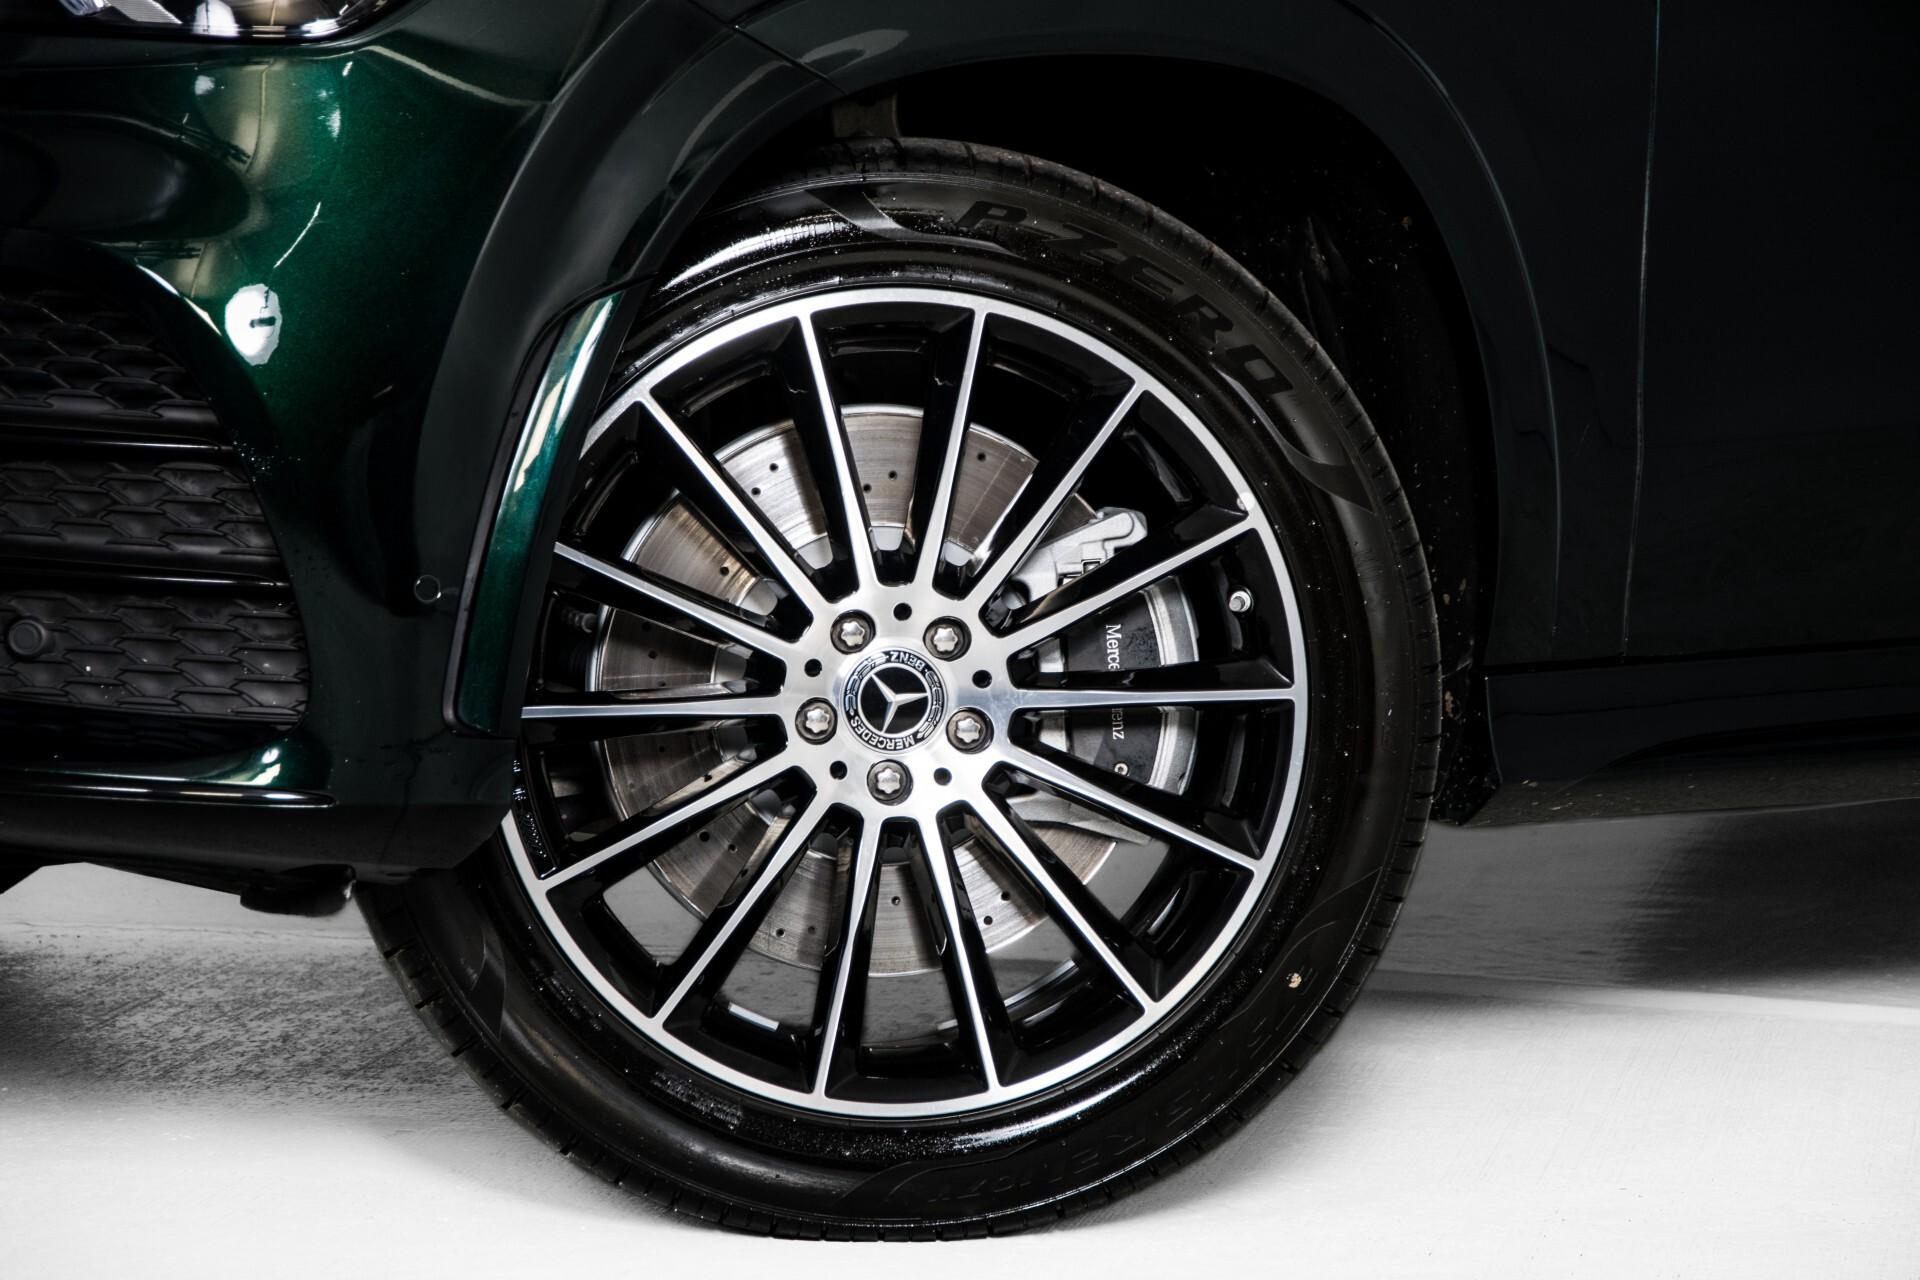 Mercedes-Benz GLE 450 4-M 7-Persoons AMG Massage/Rij-assist/Keyless/TV/360/Night/Trekhaak Aut9 Foto 73